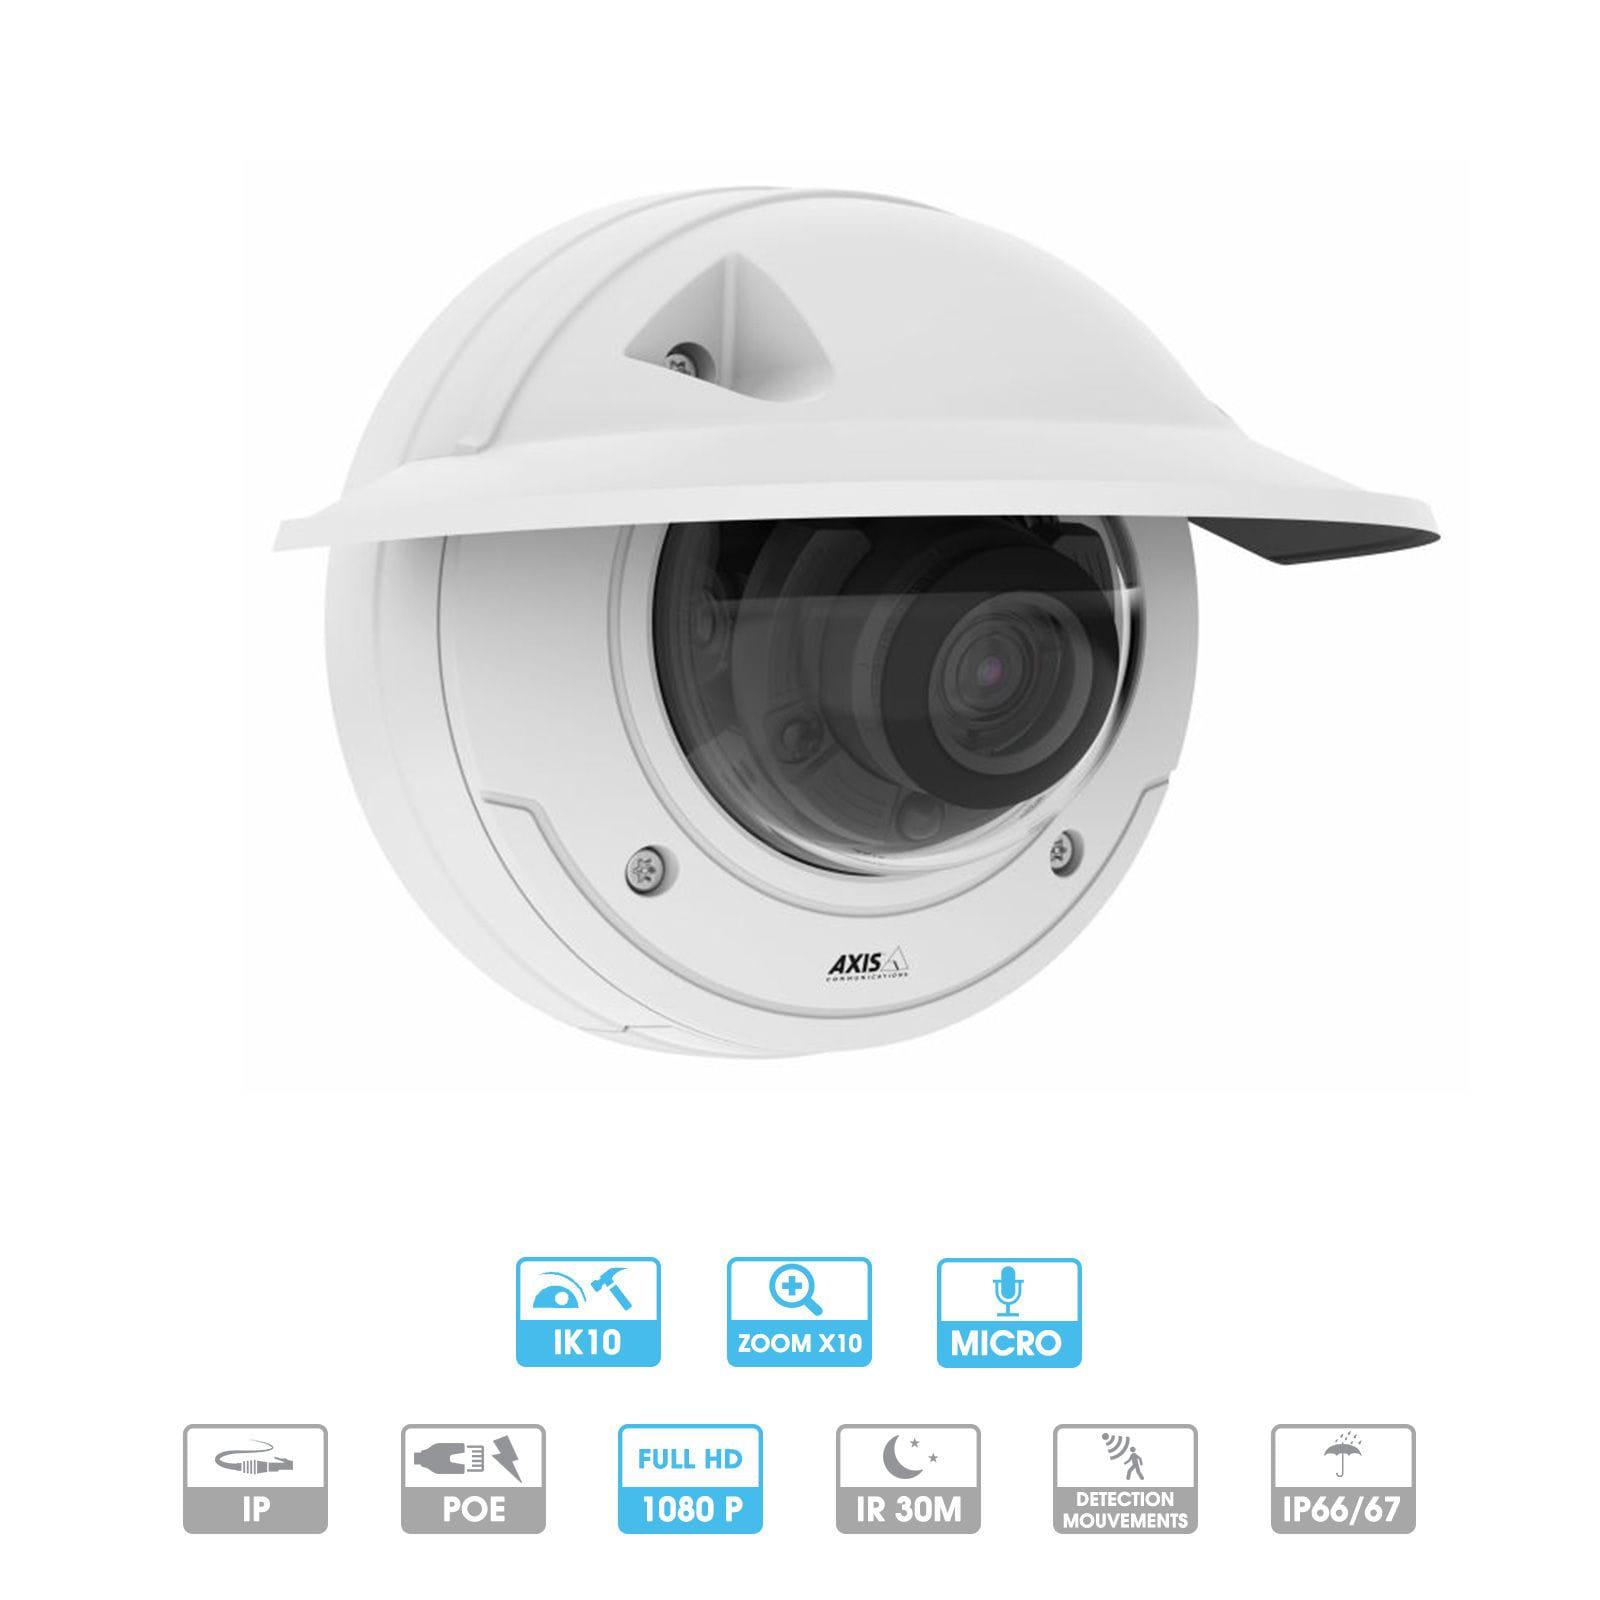 Caméra Axis | P3375-LVE | 1080 P | Antivandalisme | Zoom | IP